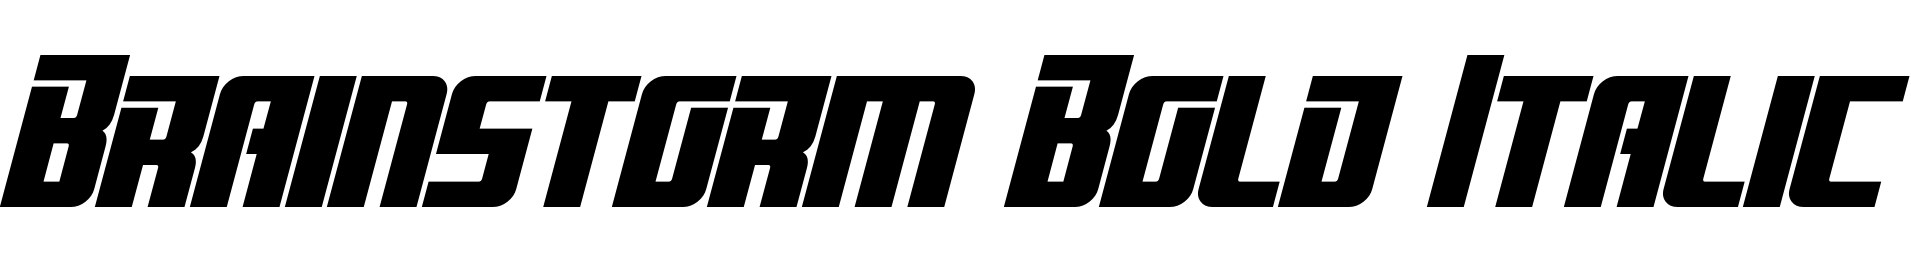 Brainstorm Bold Italic